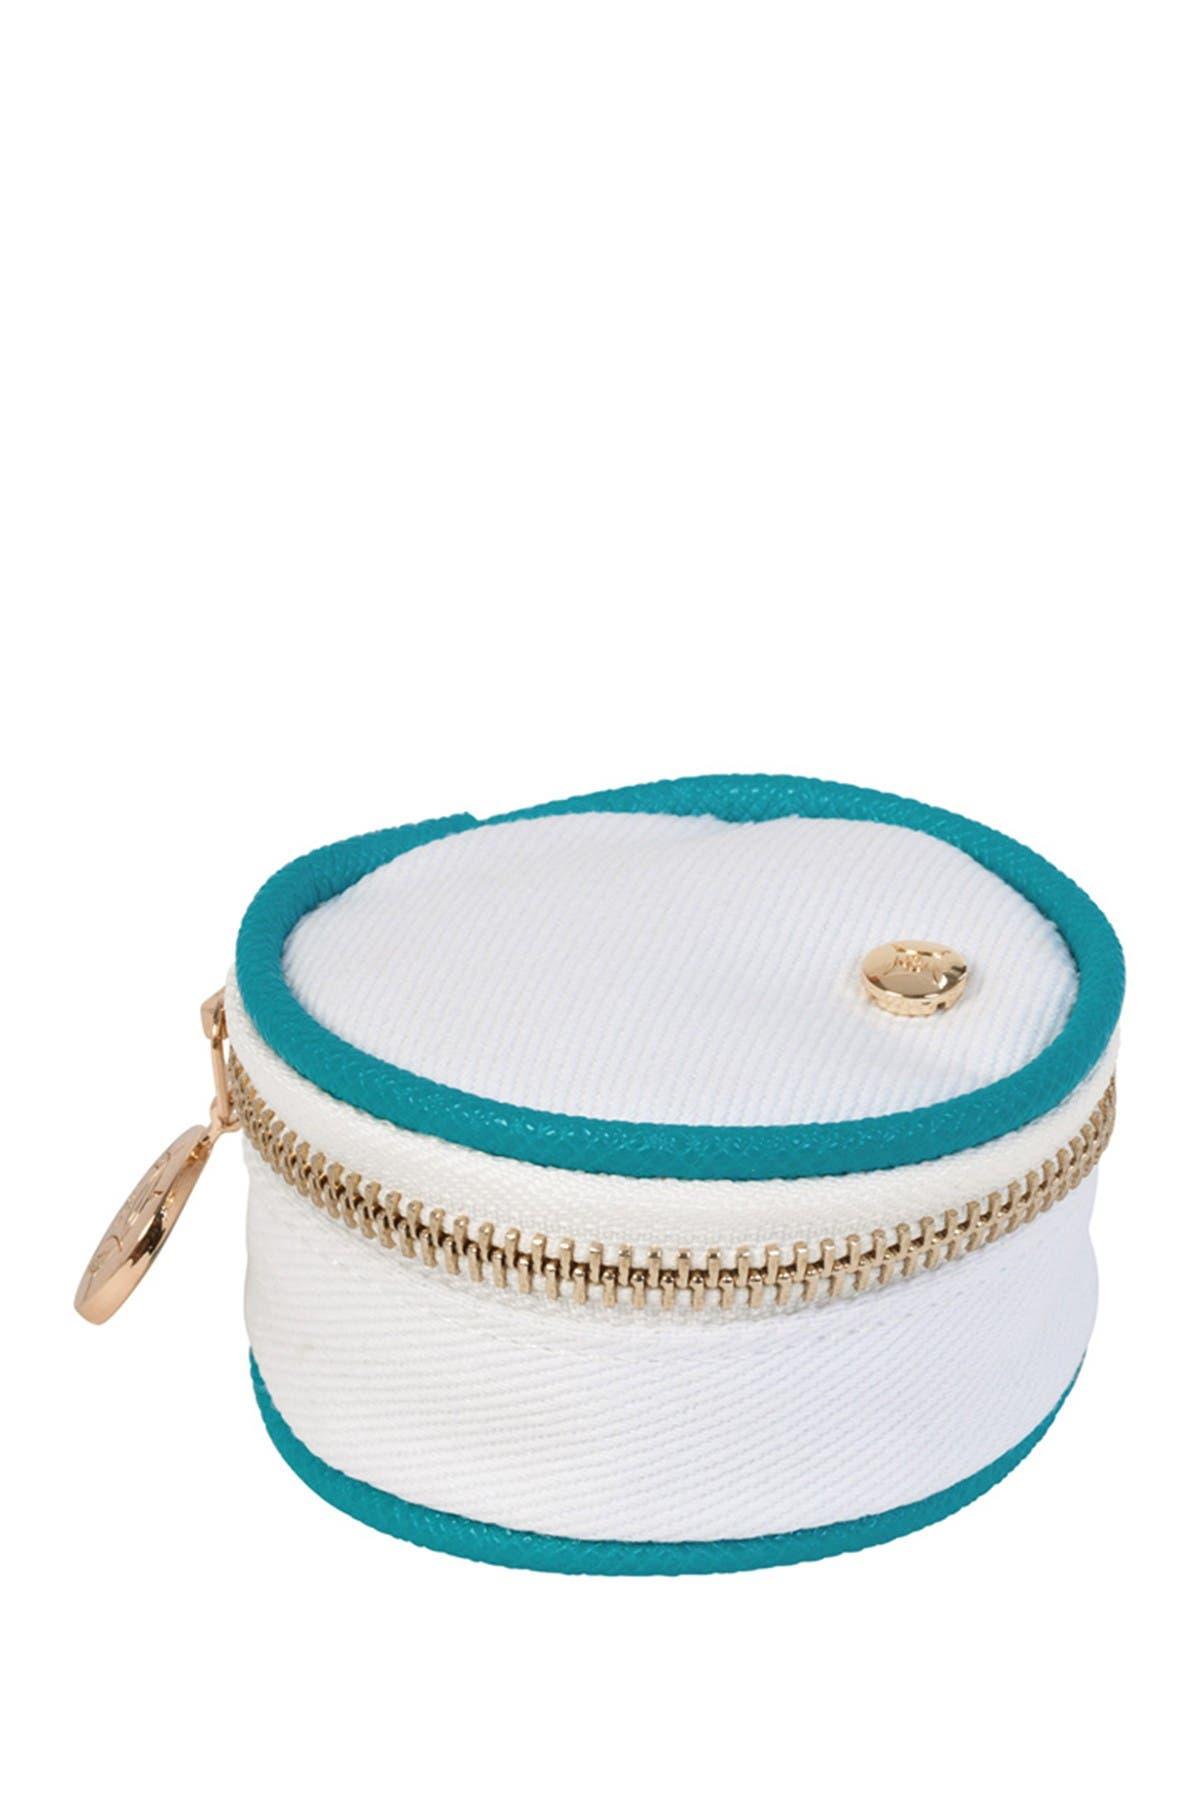 Stephanie Johnson Key West Angie Small Round Accessories Case - Blue